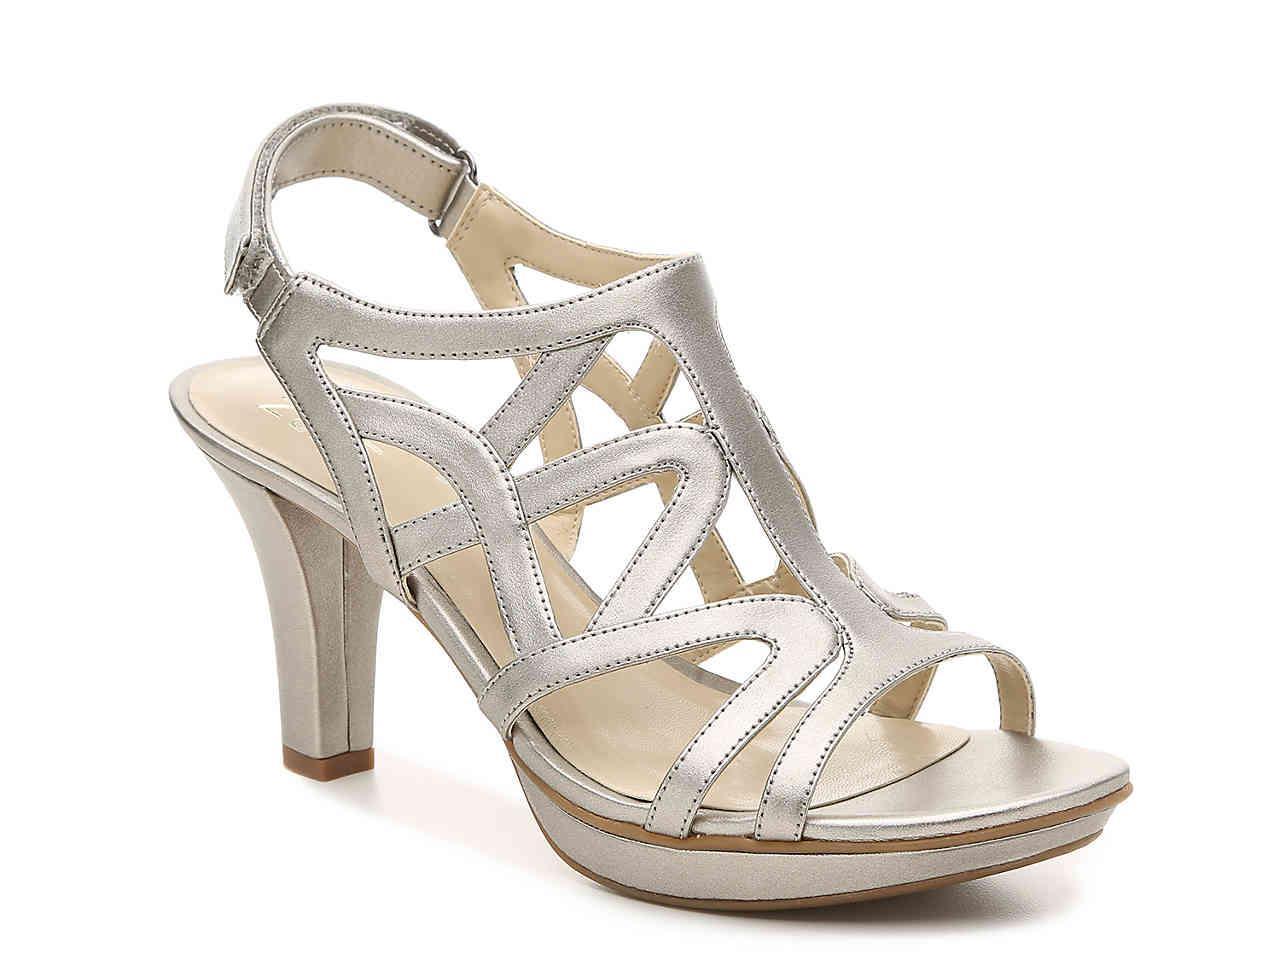 Danya Metallic Caged Dress Sandals dYutoWpd69